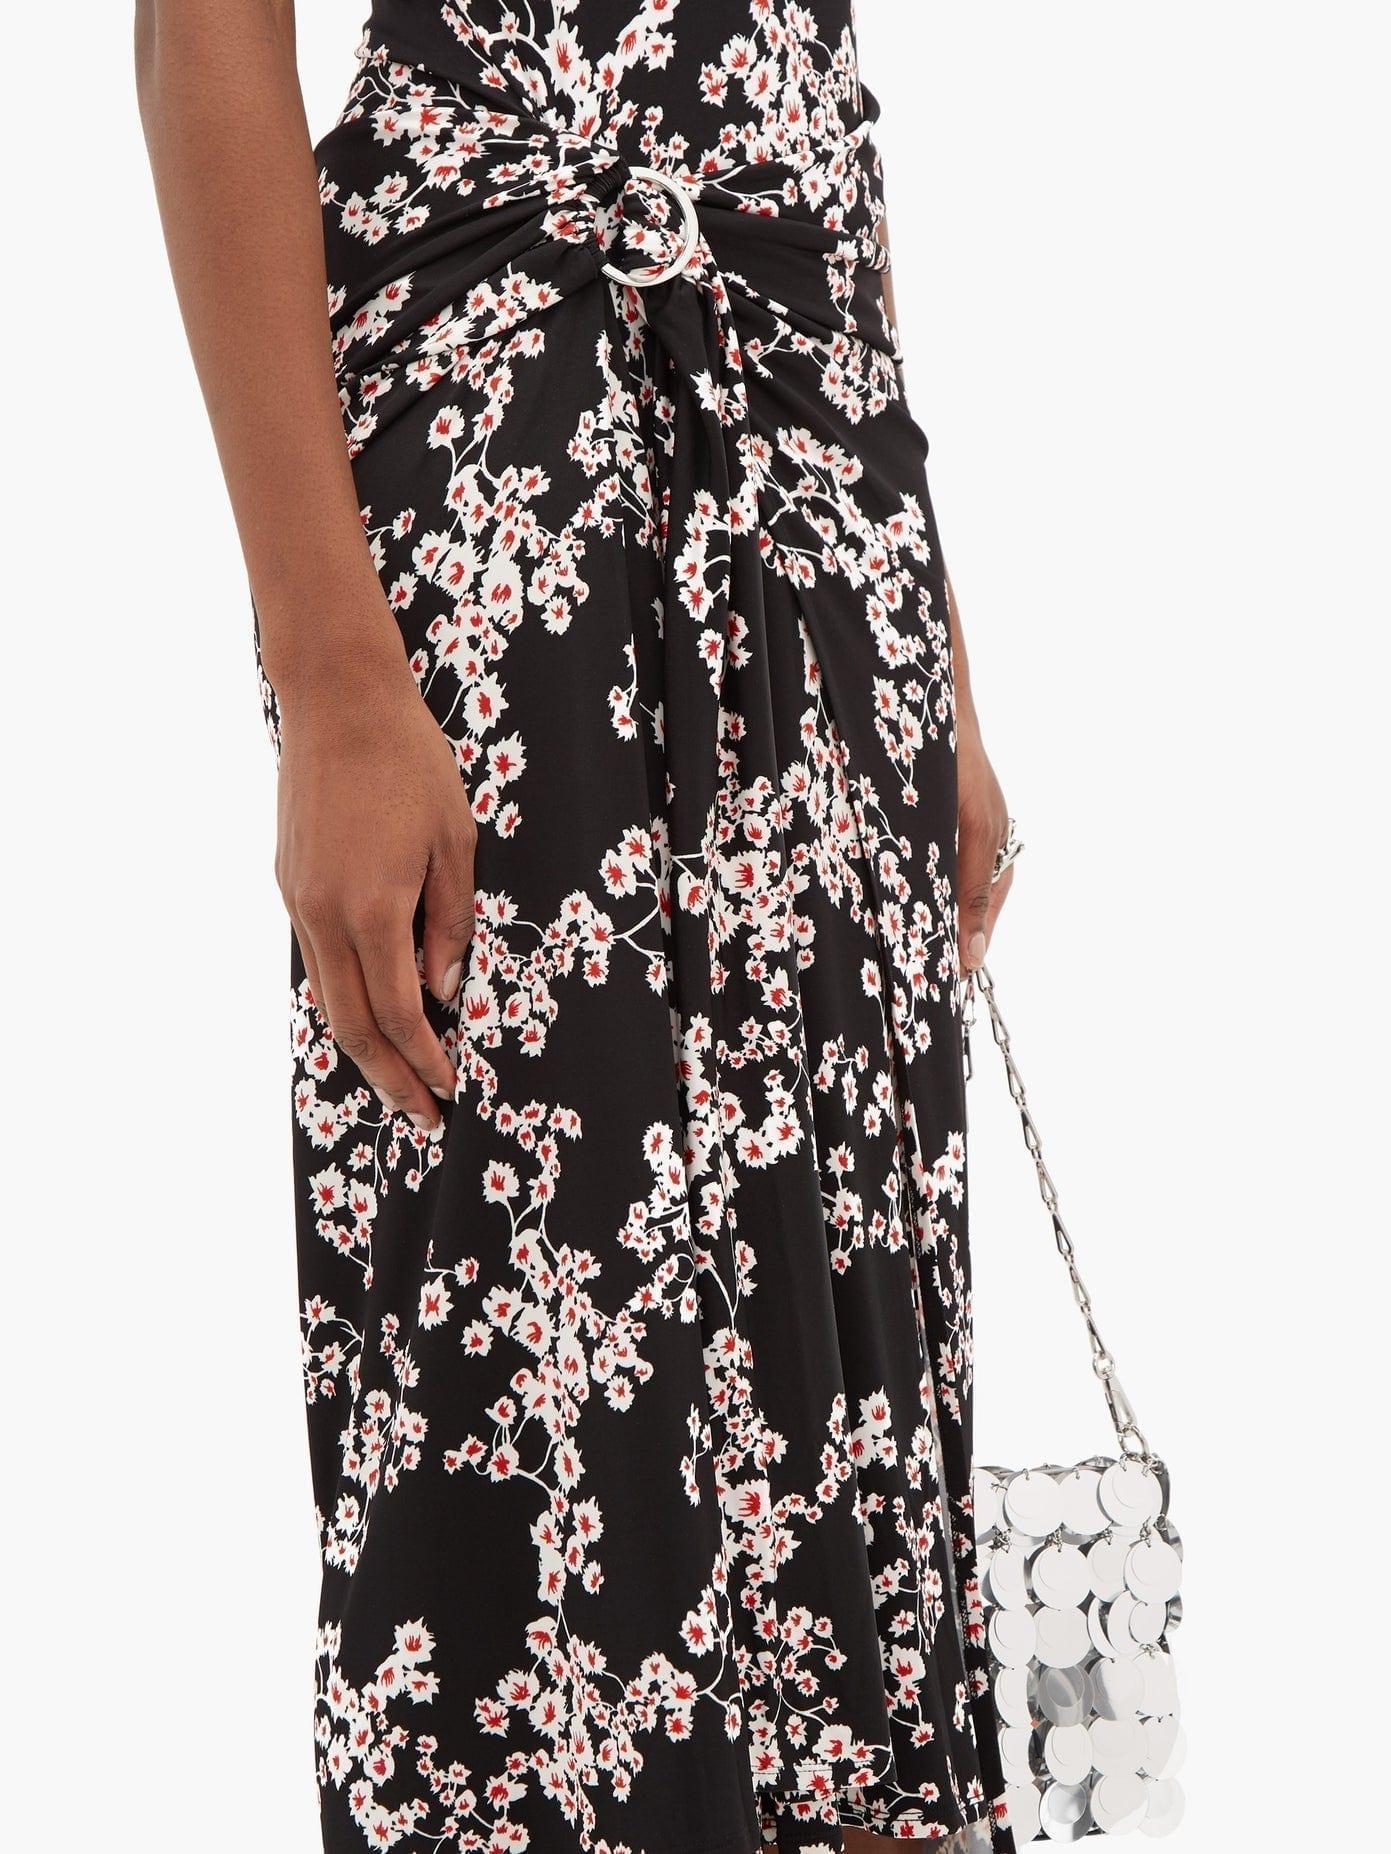 PACO RABANNE Floral-Print Jersey Wrap Dress